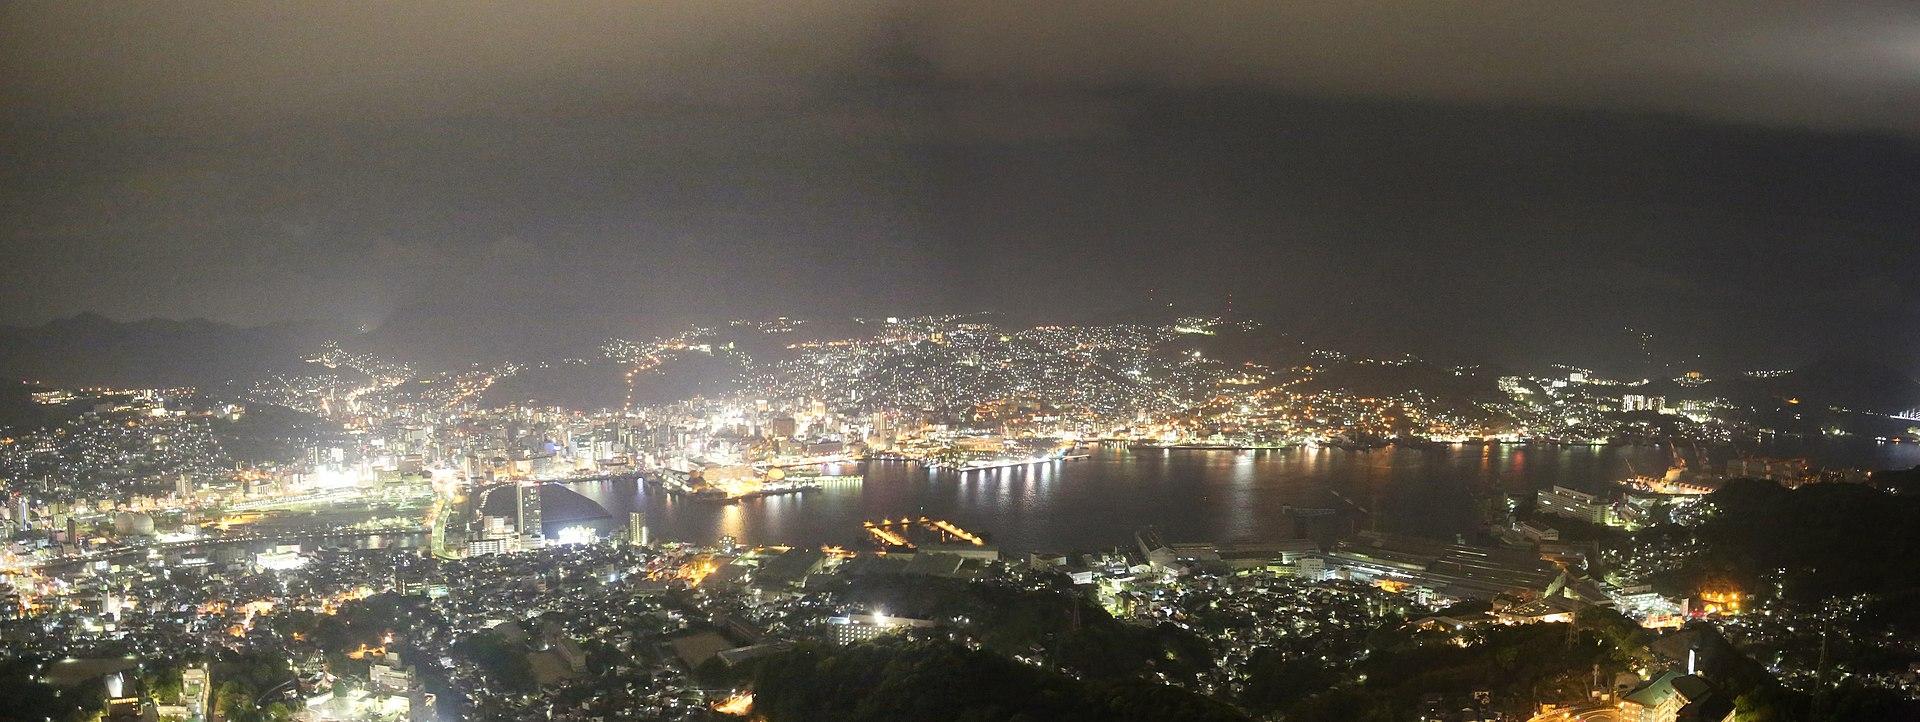 Inasamachi, Nagasaki, Nagasaki Prefecture 852-8011, Japan - panoramio.jpg